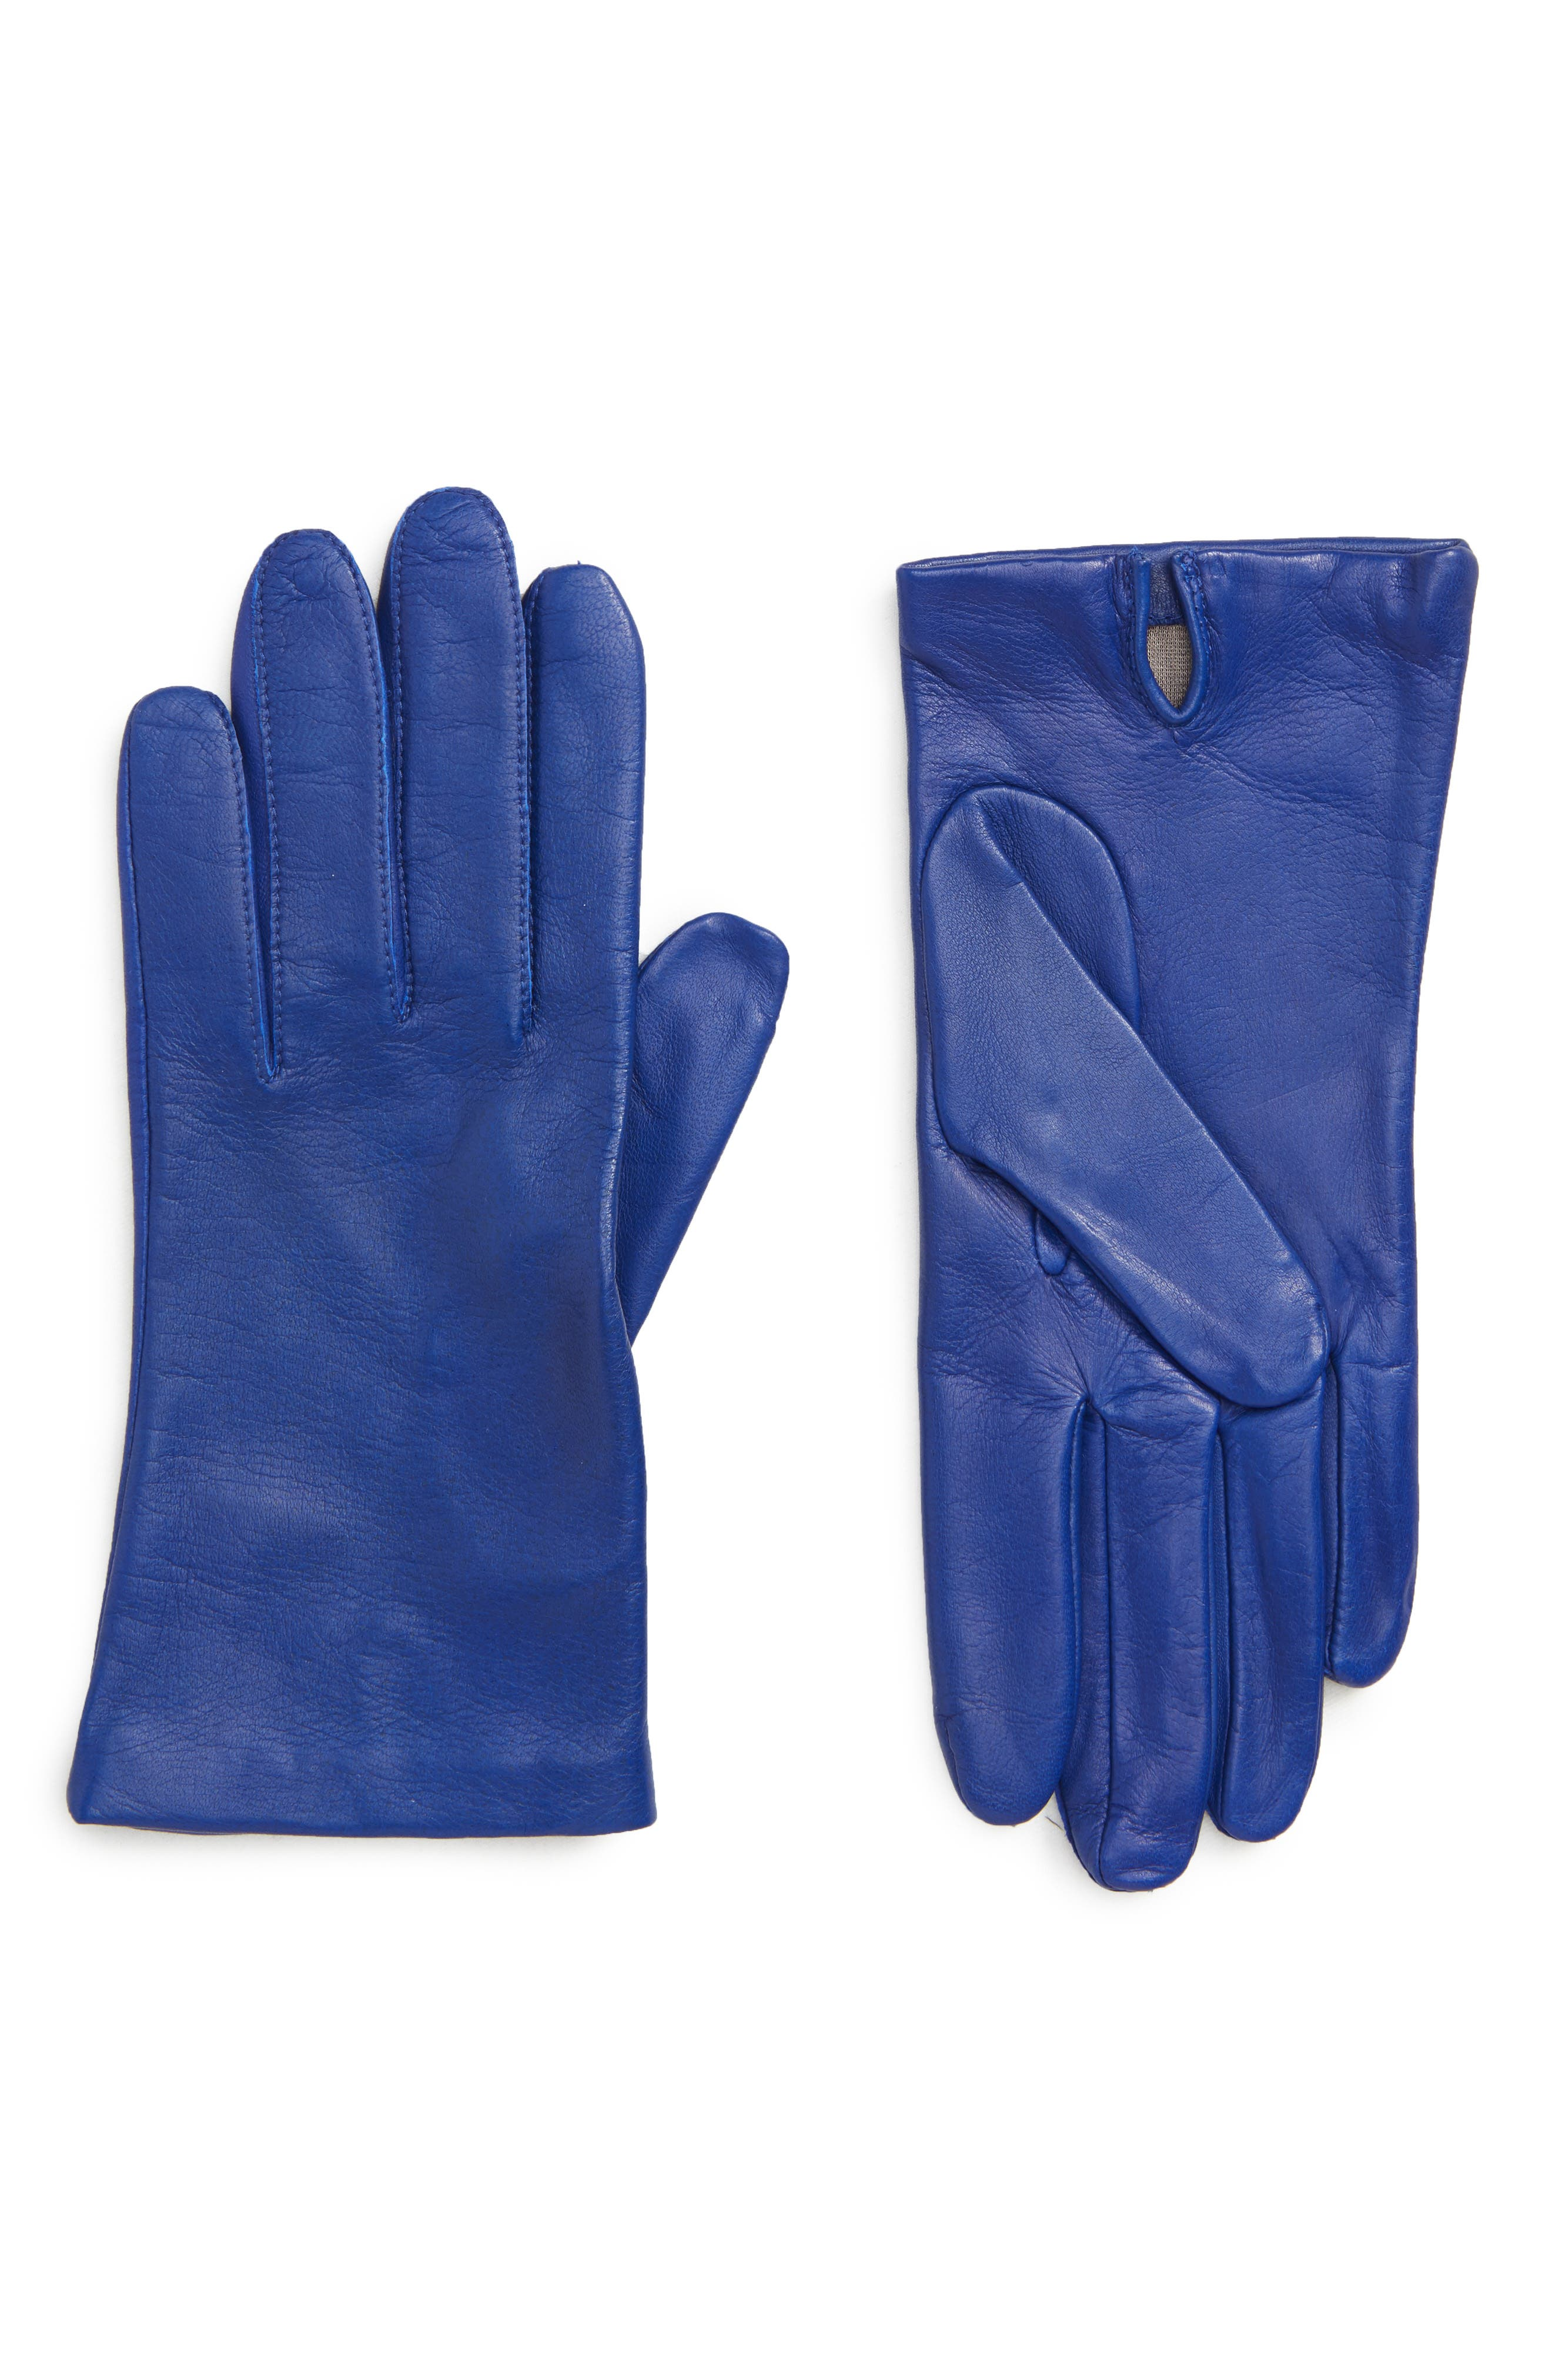 Nordstrom Lambskin Leather Gloves, Blue